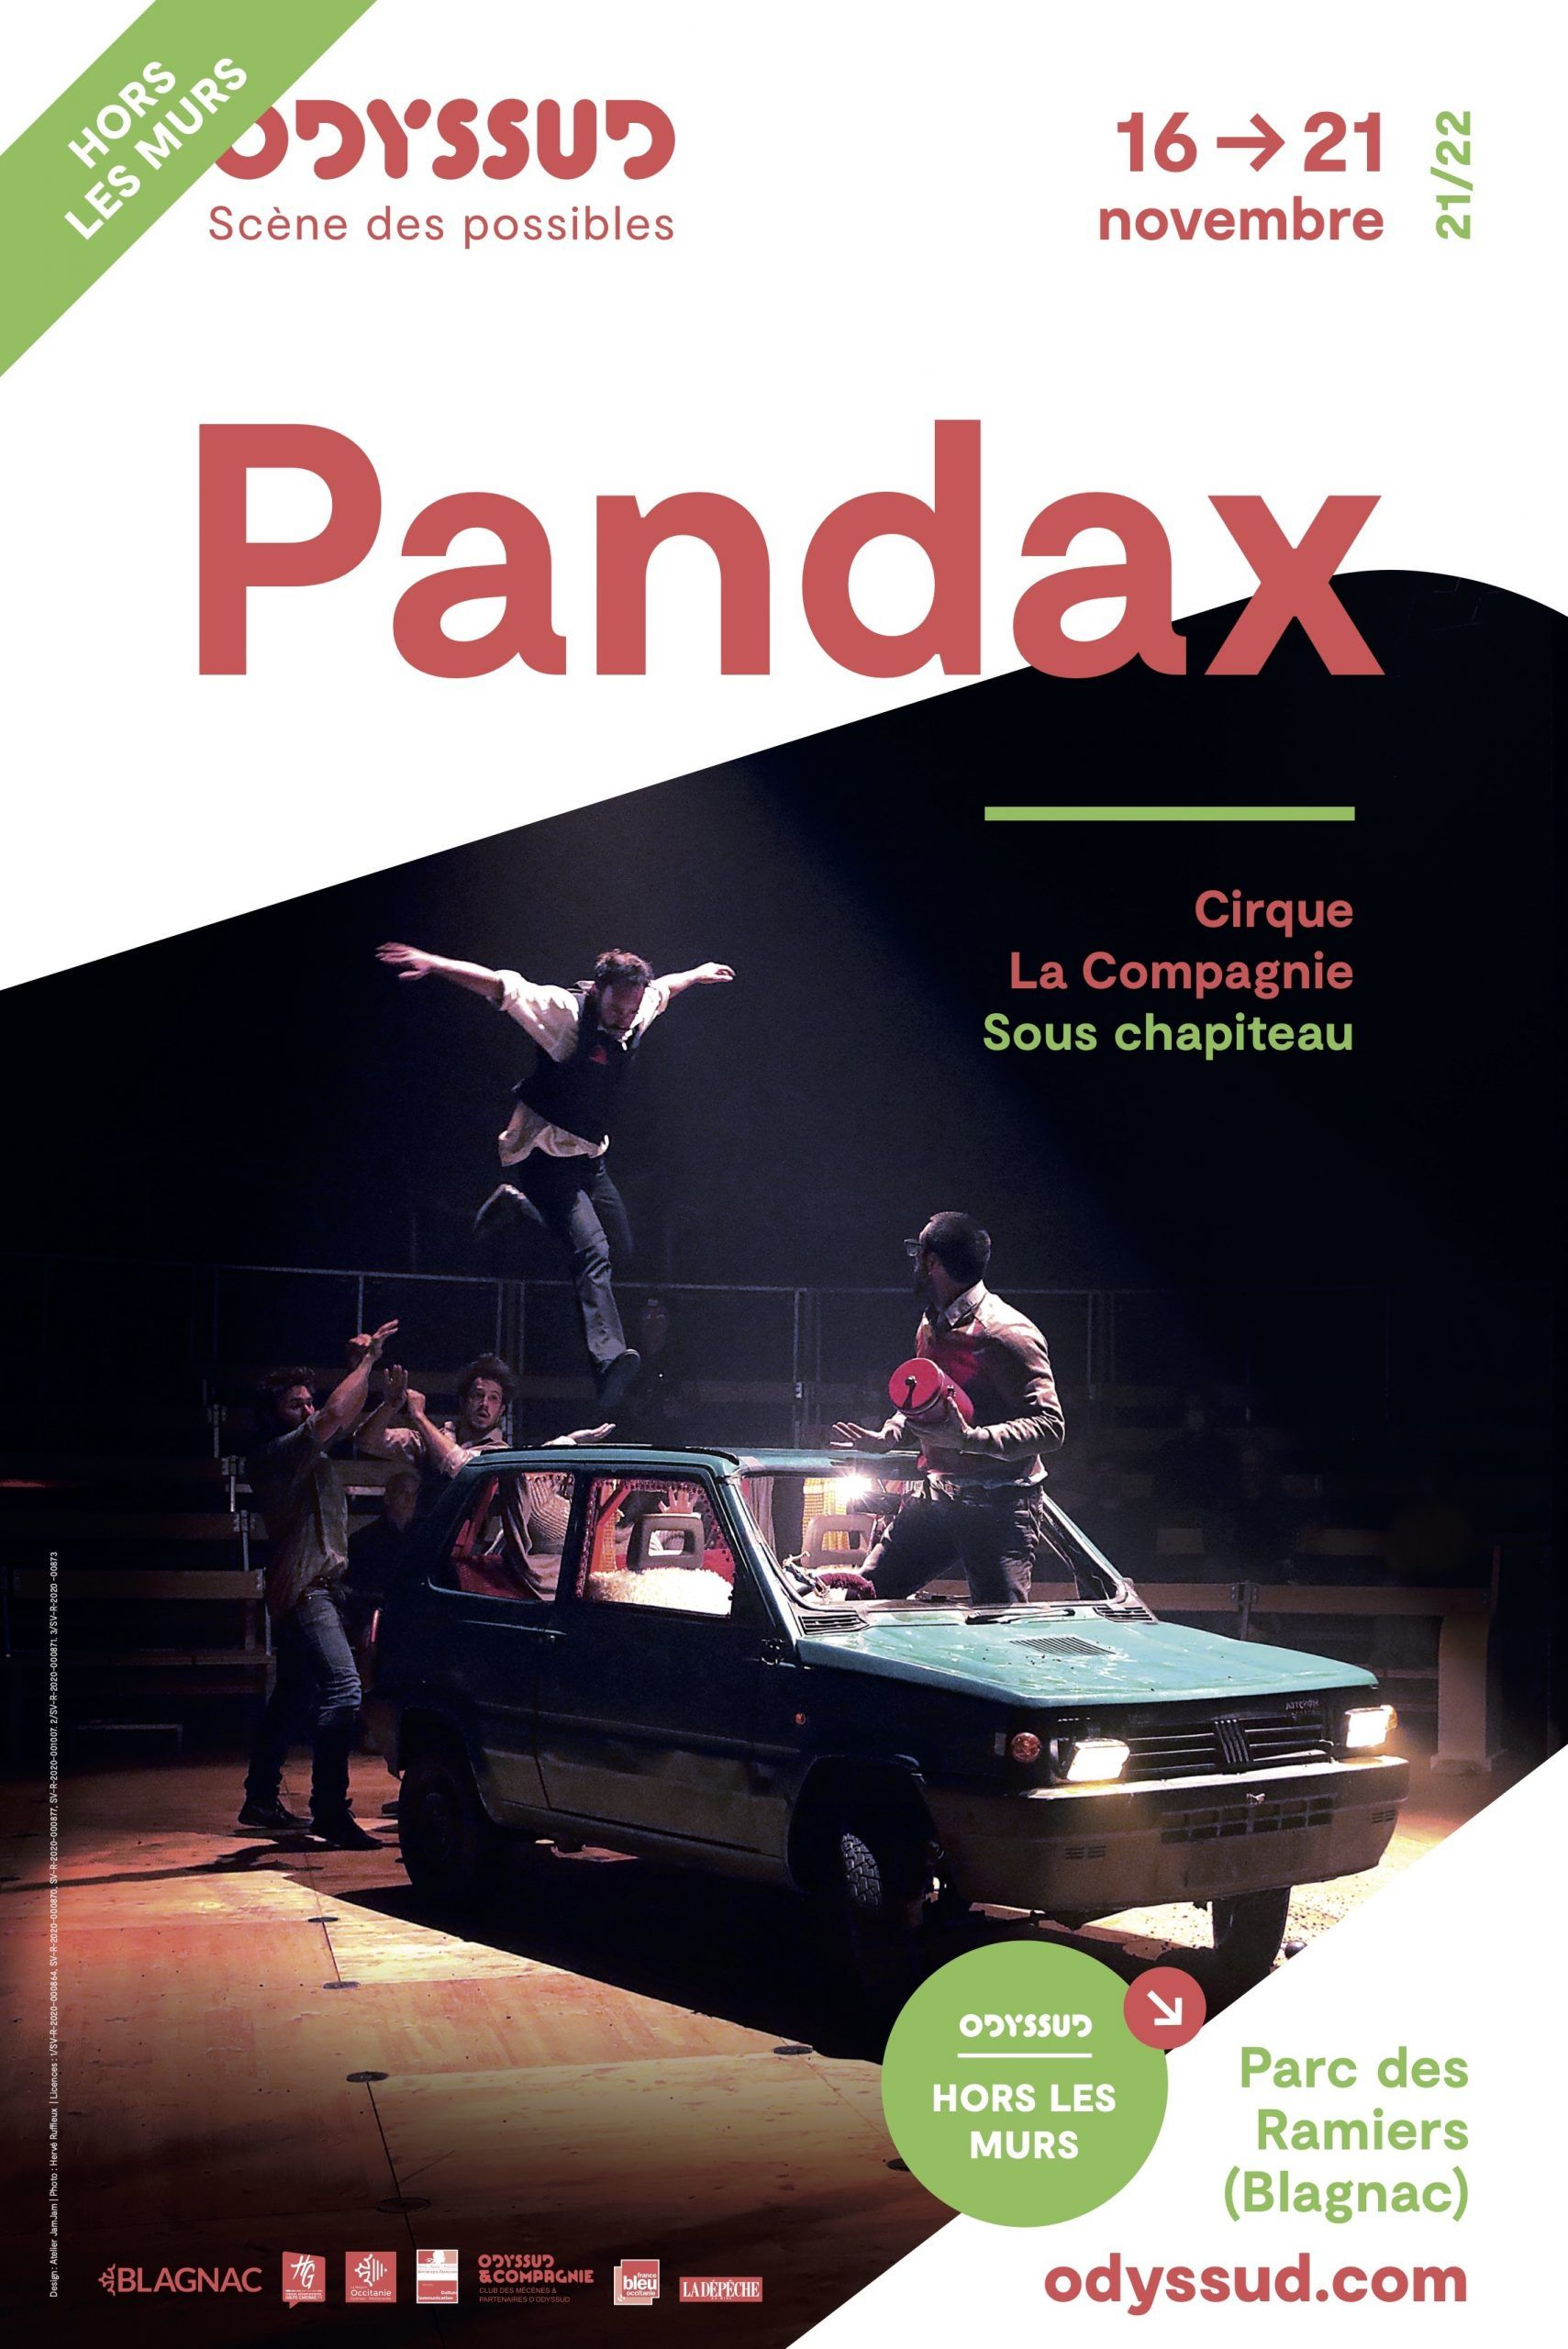 Odyssud - Pandax